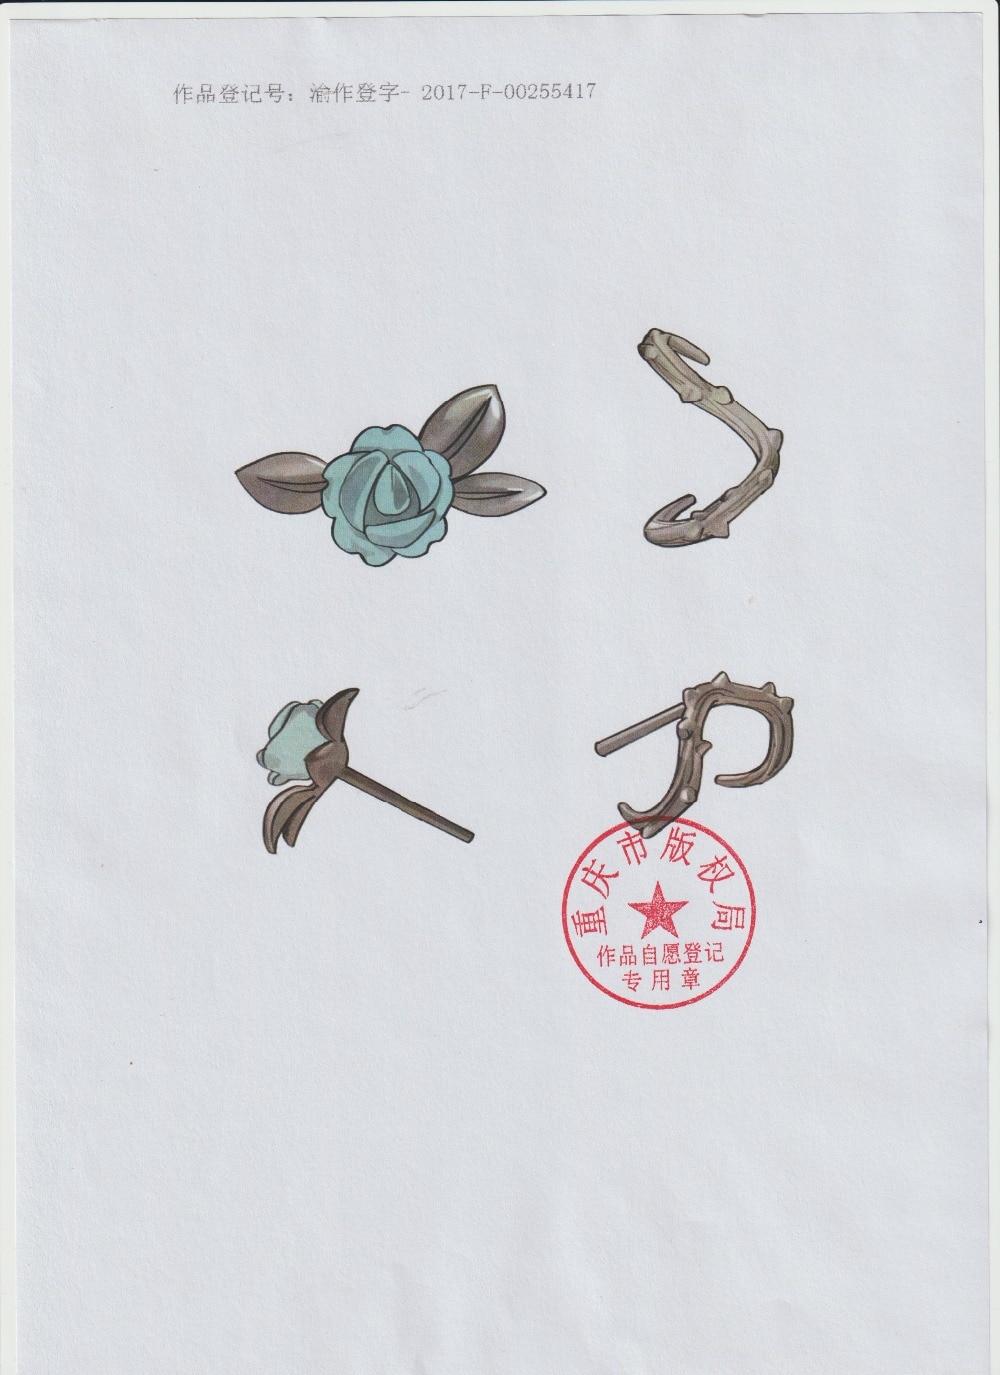 HTB13A22EH1YBuNjSszeq6yblFXaU Thaya s925 Silver Thorn Blue Crystal Rose Design Black Stud Earrings for Women Asymmetry Flower Earring Female Jewelry Gift